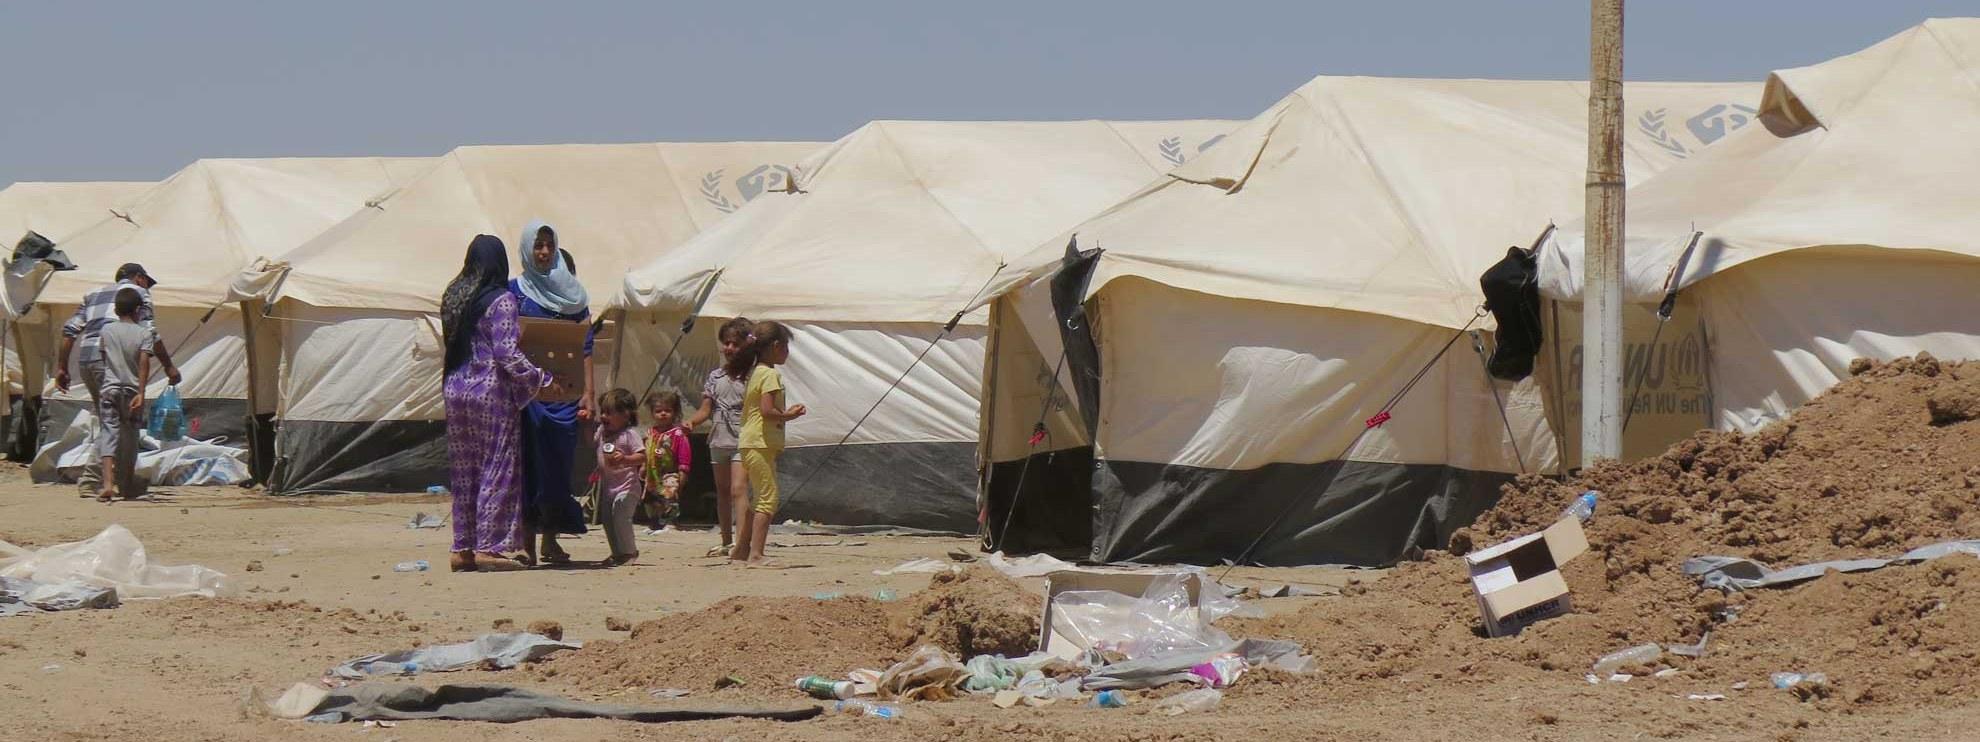 Flüchtlingslager in Kalak, Irak. © Amnesty International